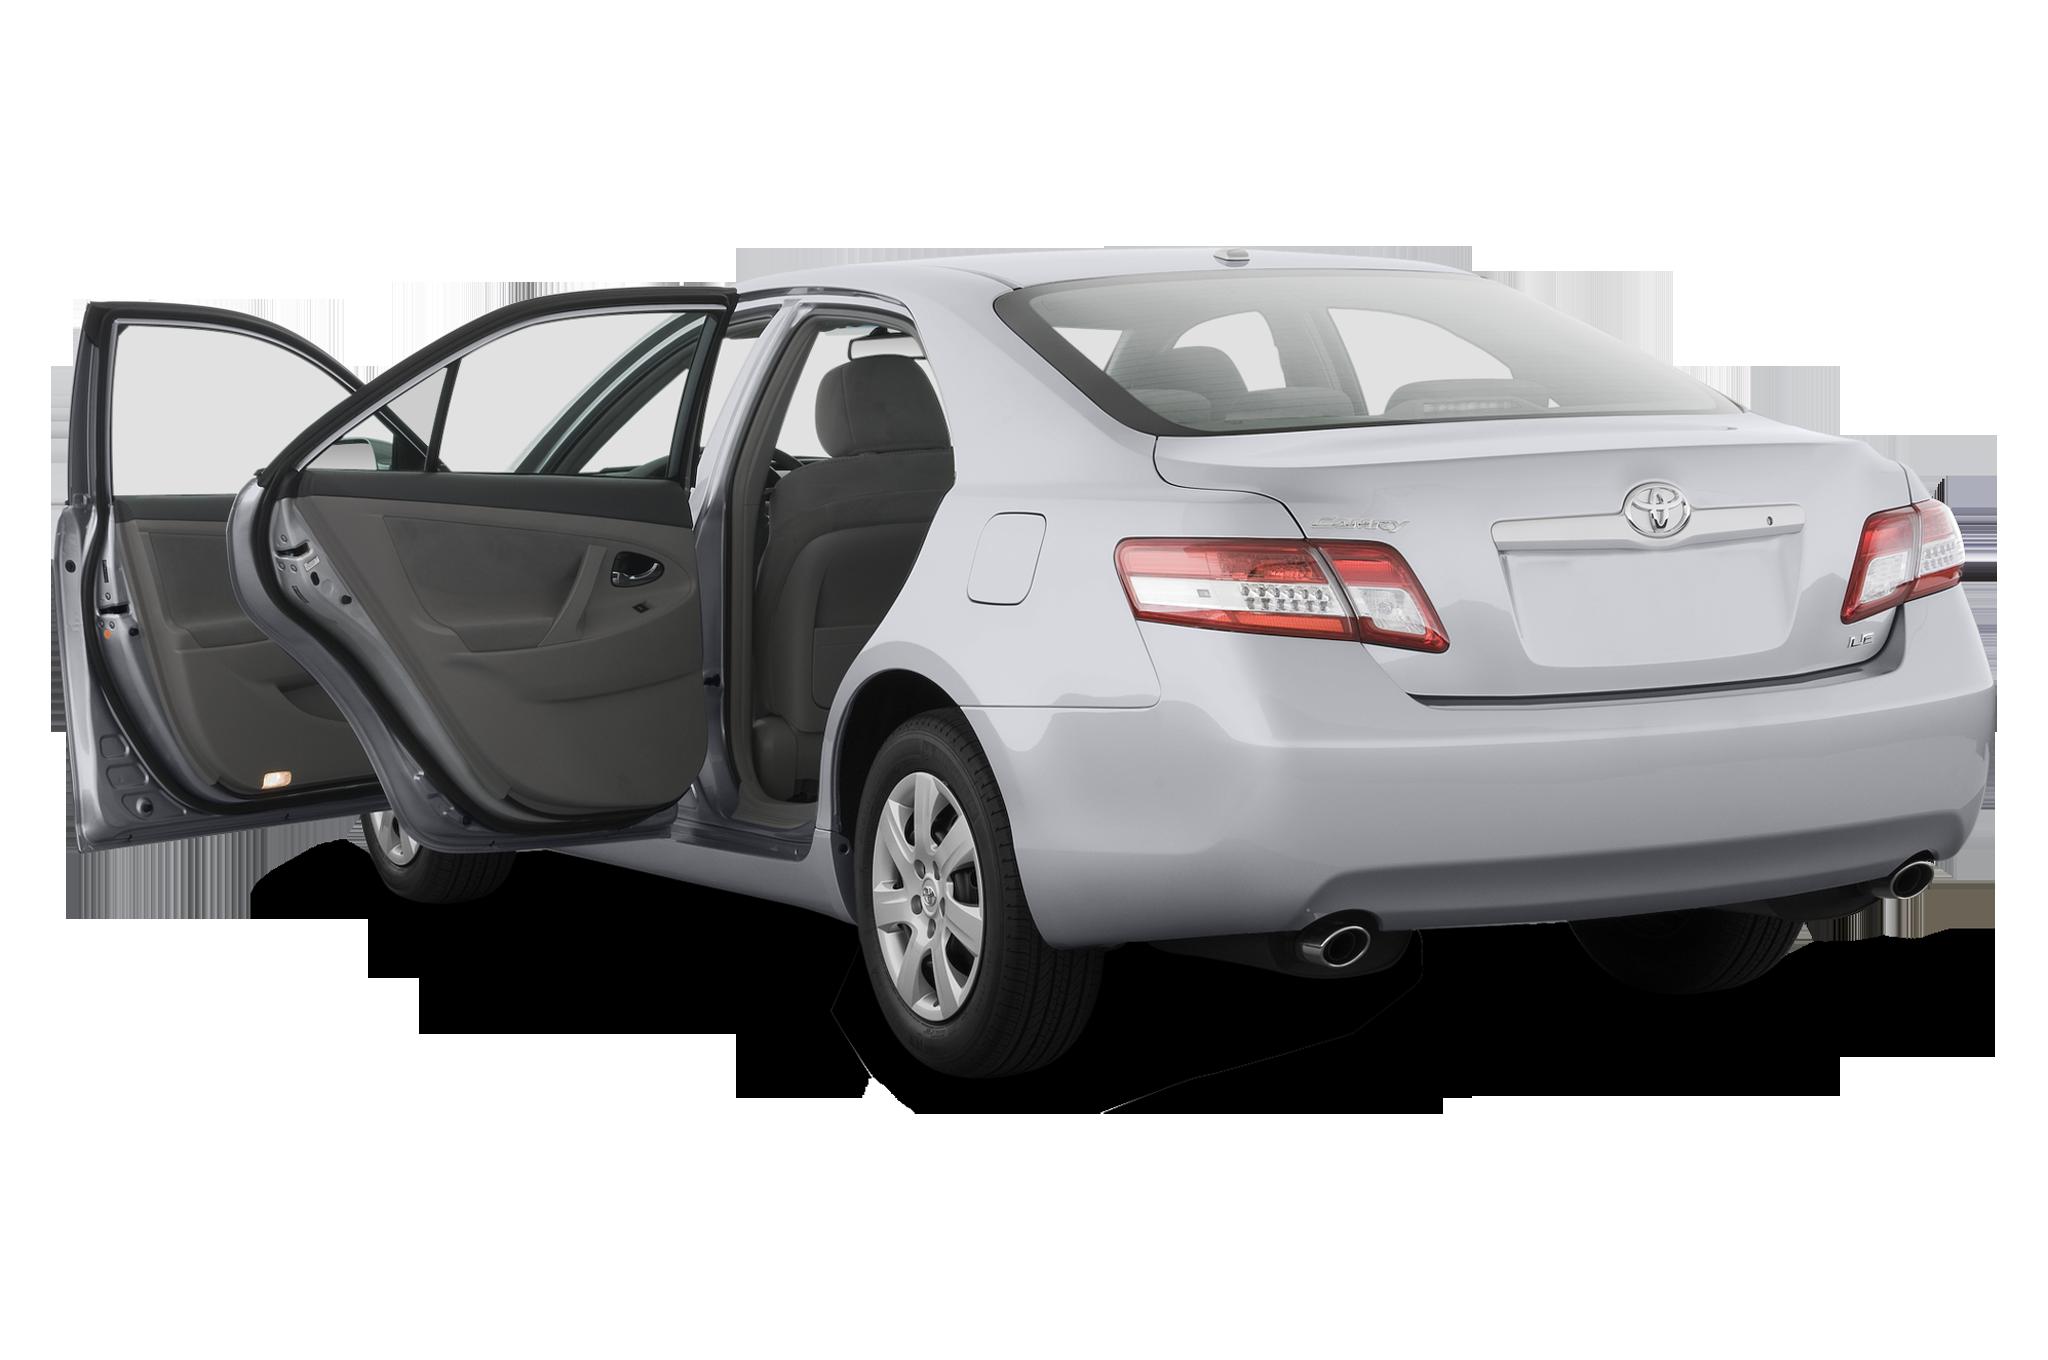 2010 toyota camry hybrid toyota hybrid sedan review automobile magazine. Black Bedroom Furniture Sets. Home Design Ideas